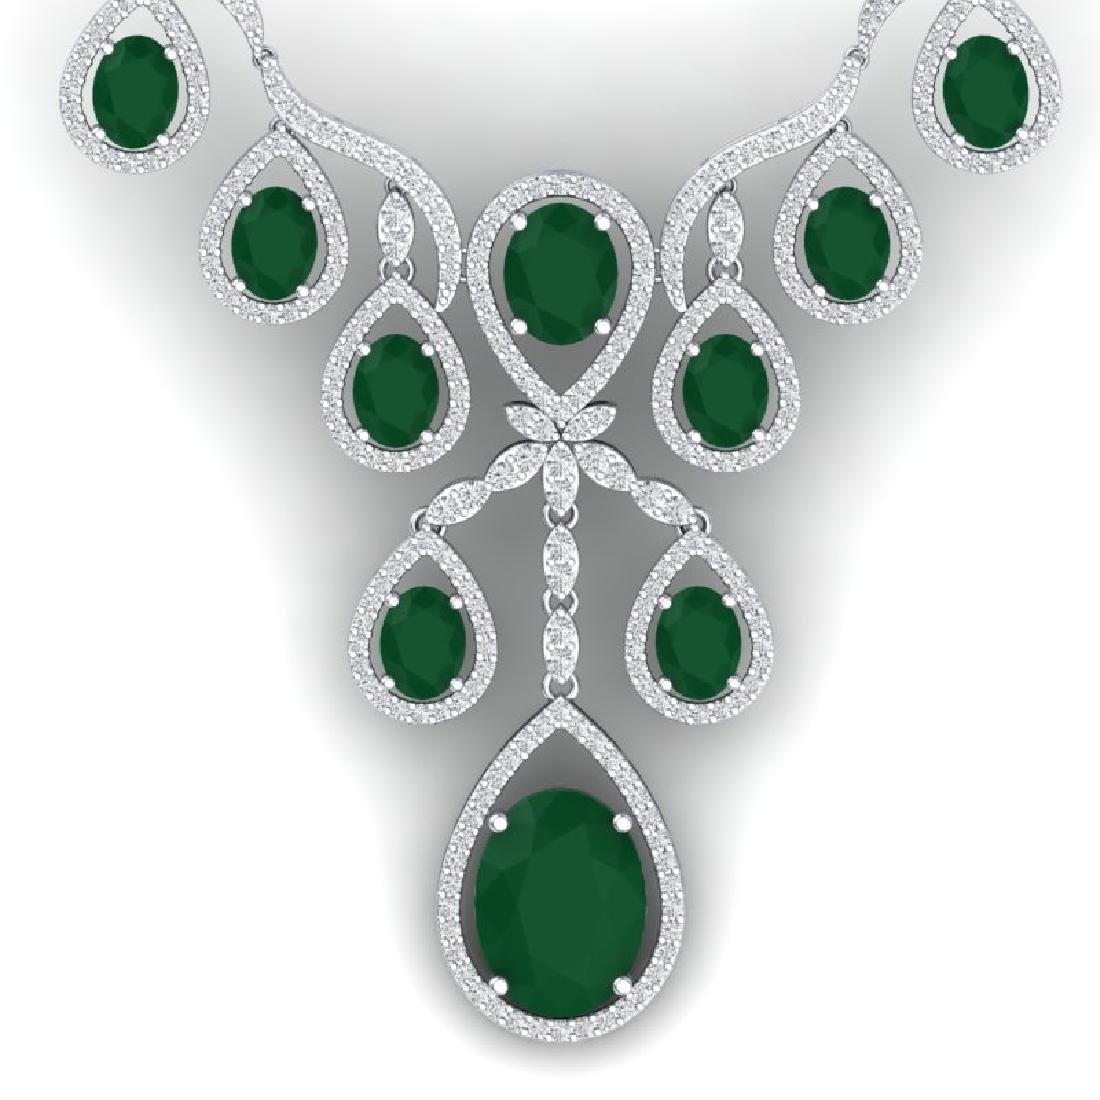 37.66 CTW Royalty Emerald & VS Diamond Necklace 18K